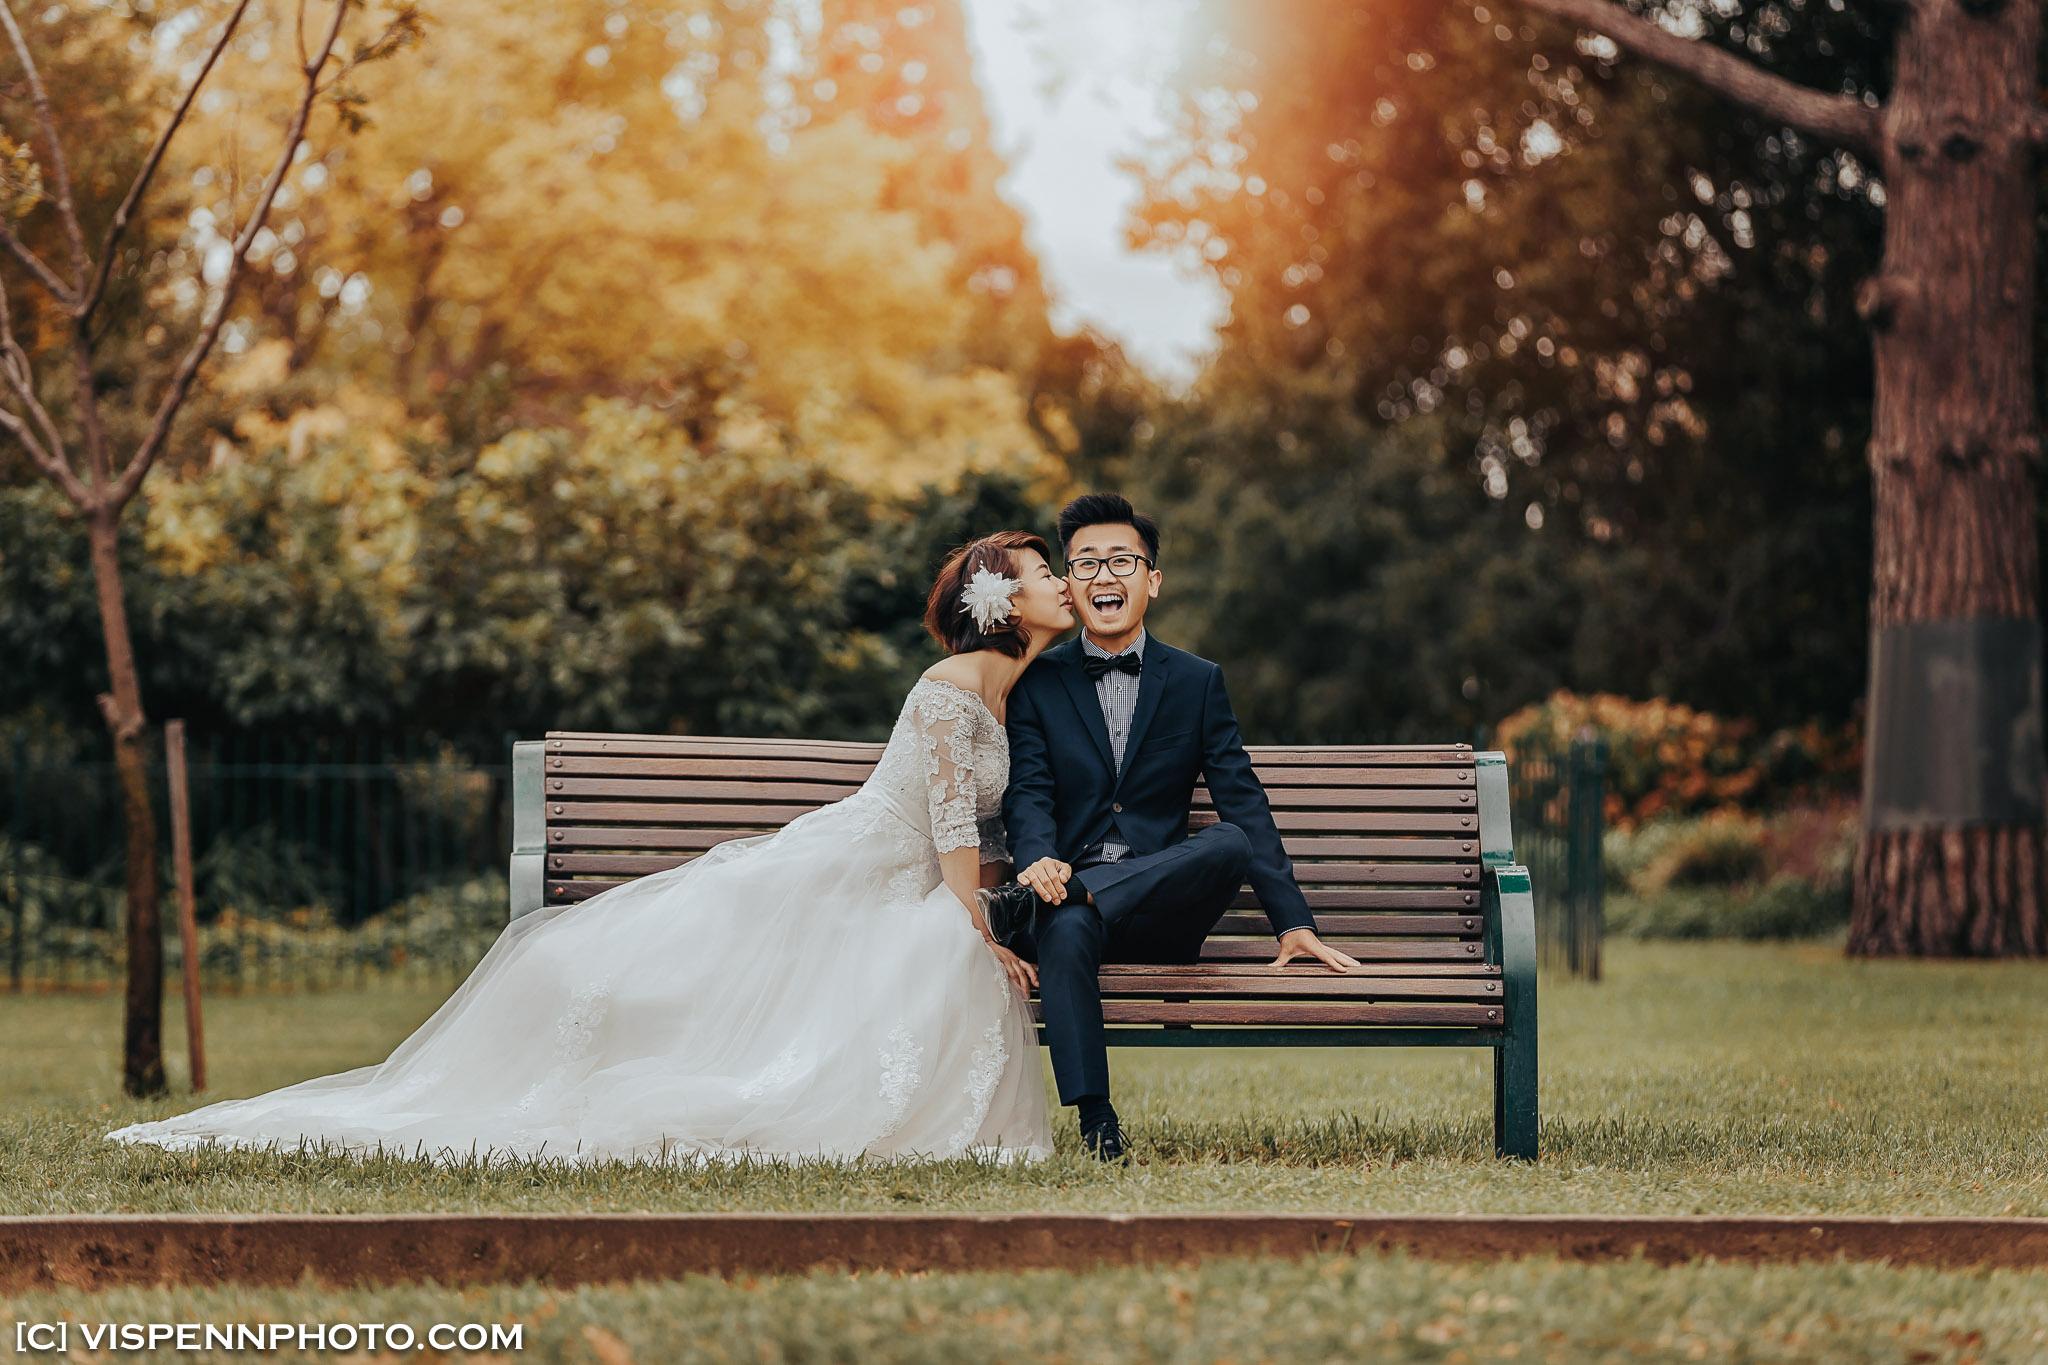 PRE WEDDING Photography Melbourne ZHPENN DaisyDanChenPreWedding 0976